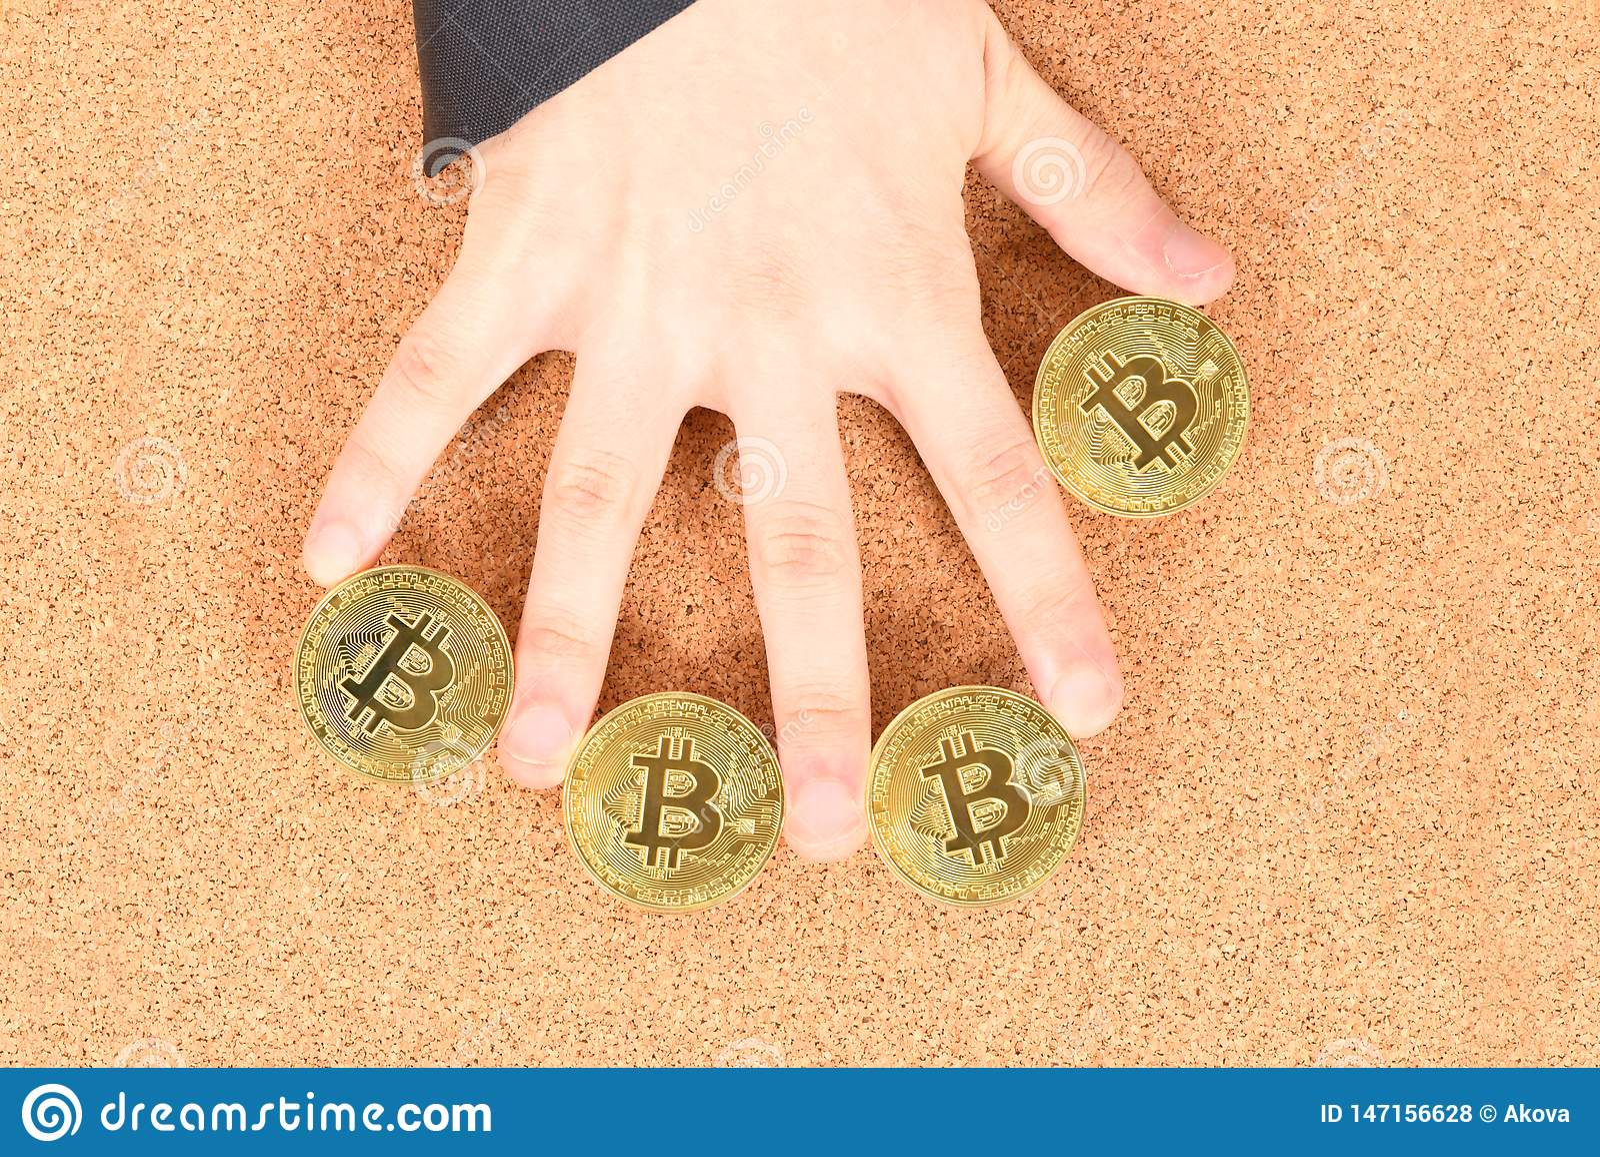 Man`s hand holding golden Bitcoin on brown textured cork background